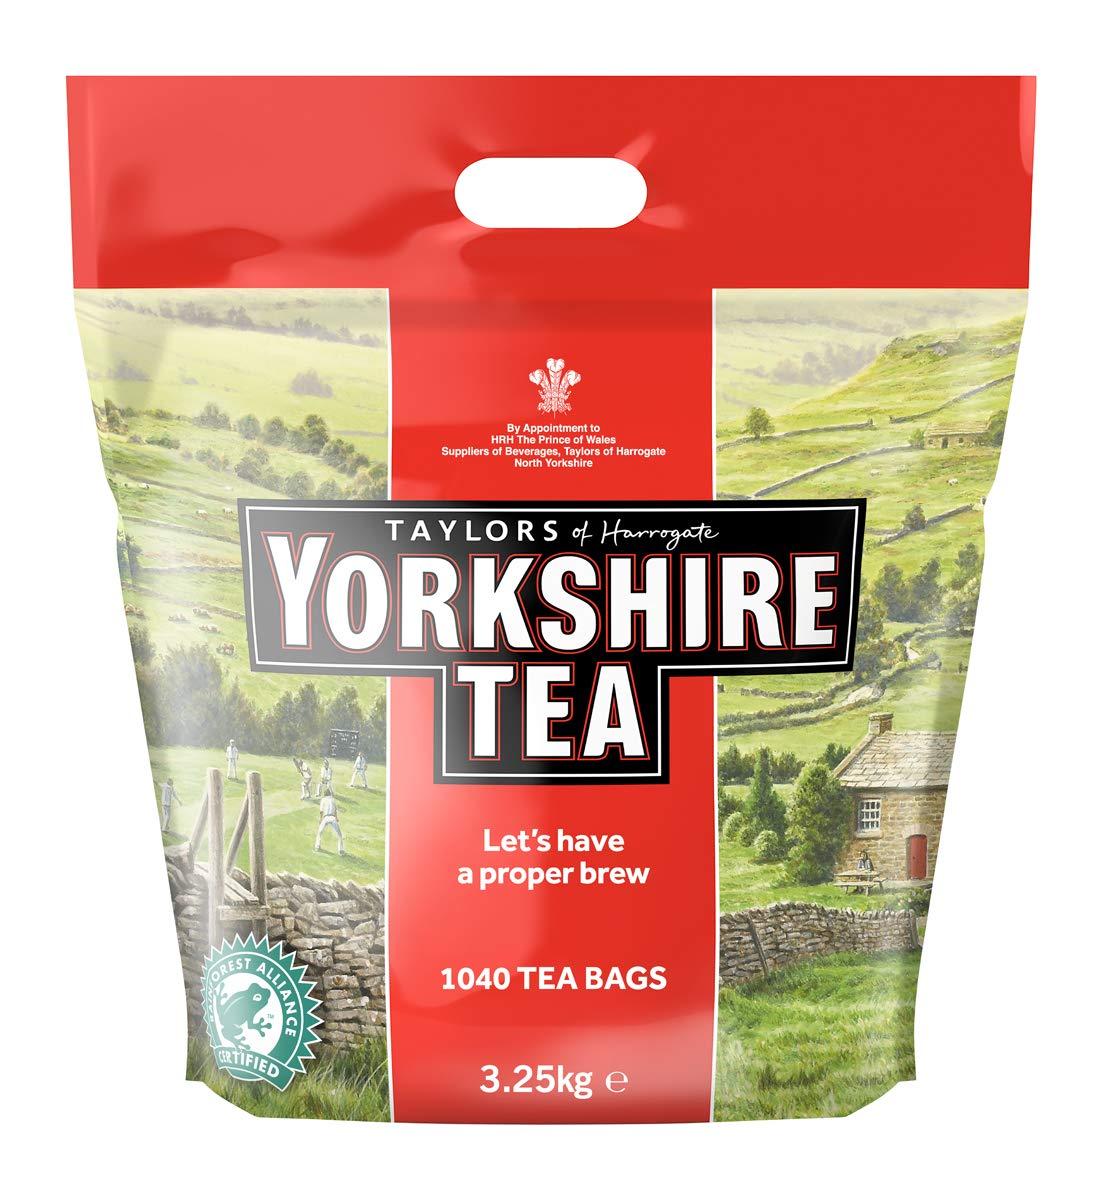 Taylors-of-Harrogate-Yorkshire-Tea-1040-Tea-Bags-325kg